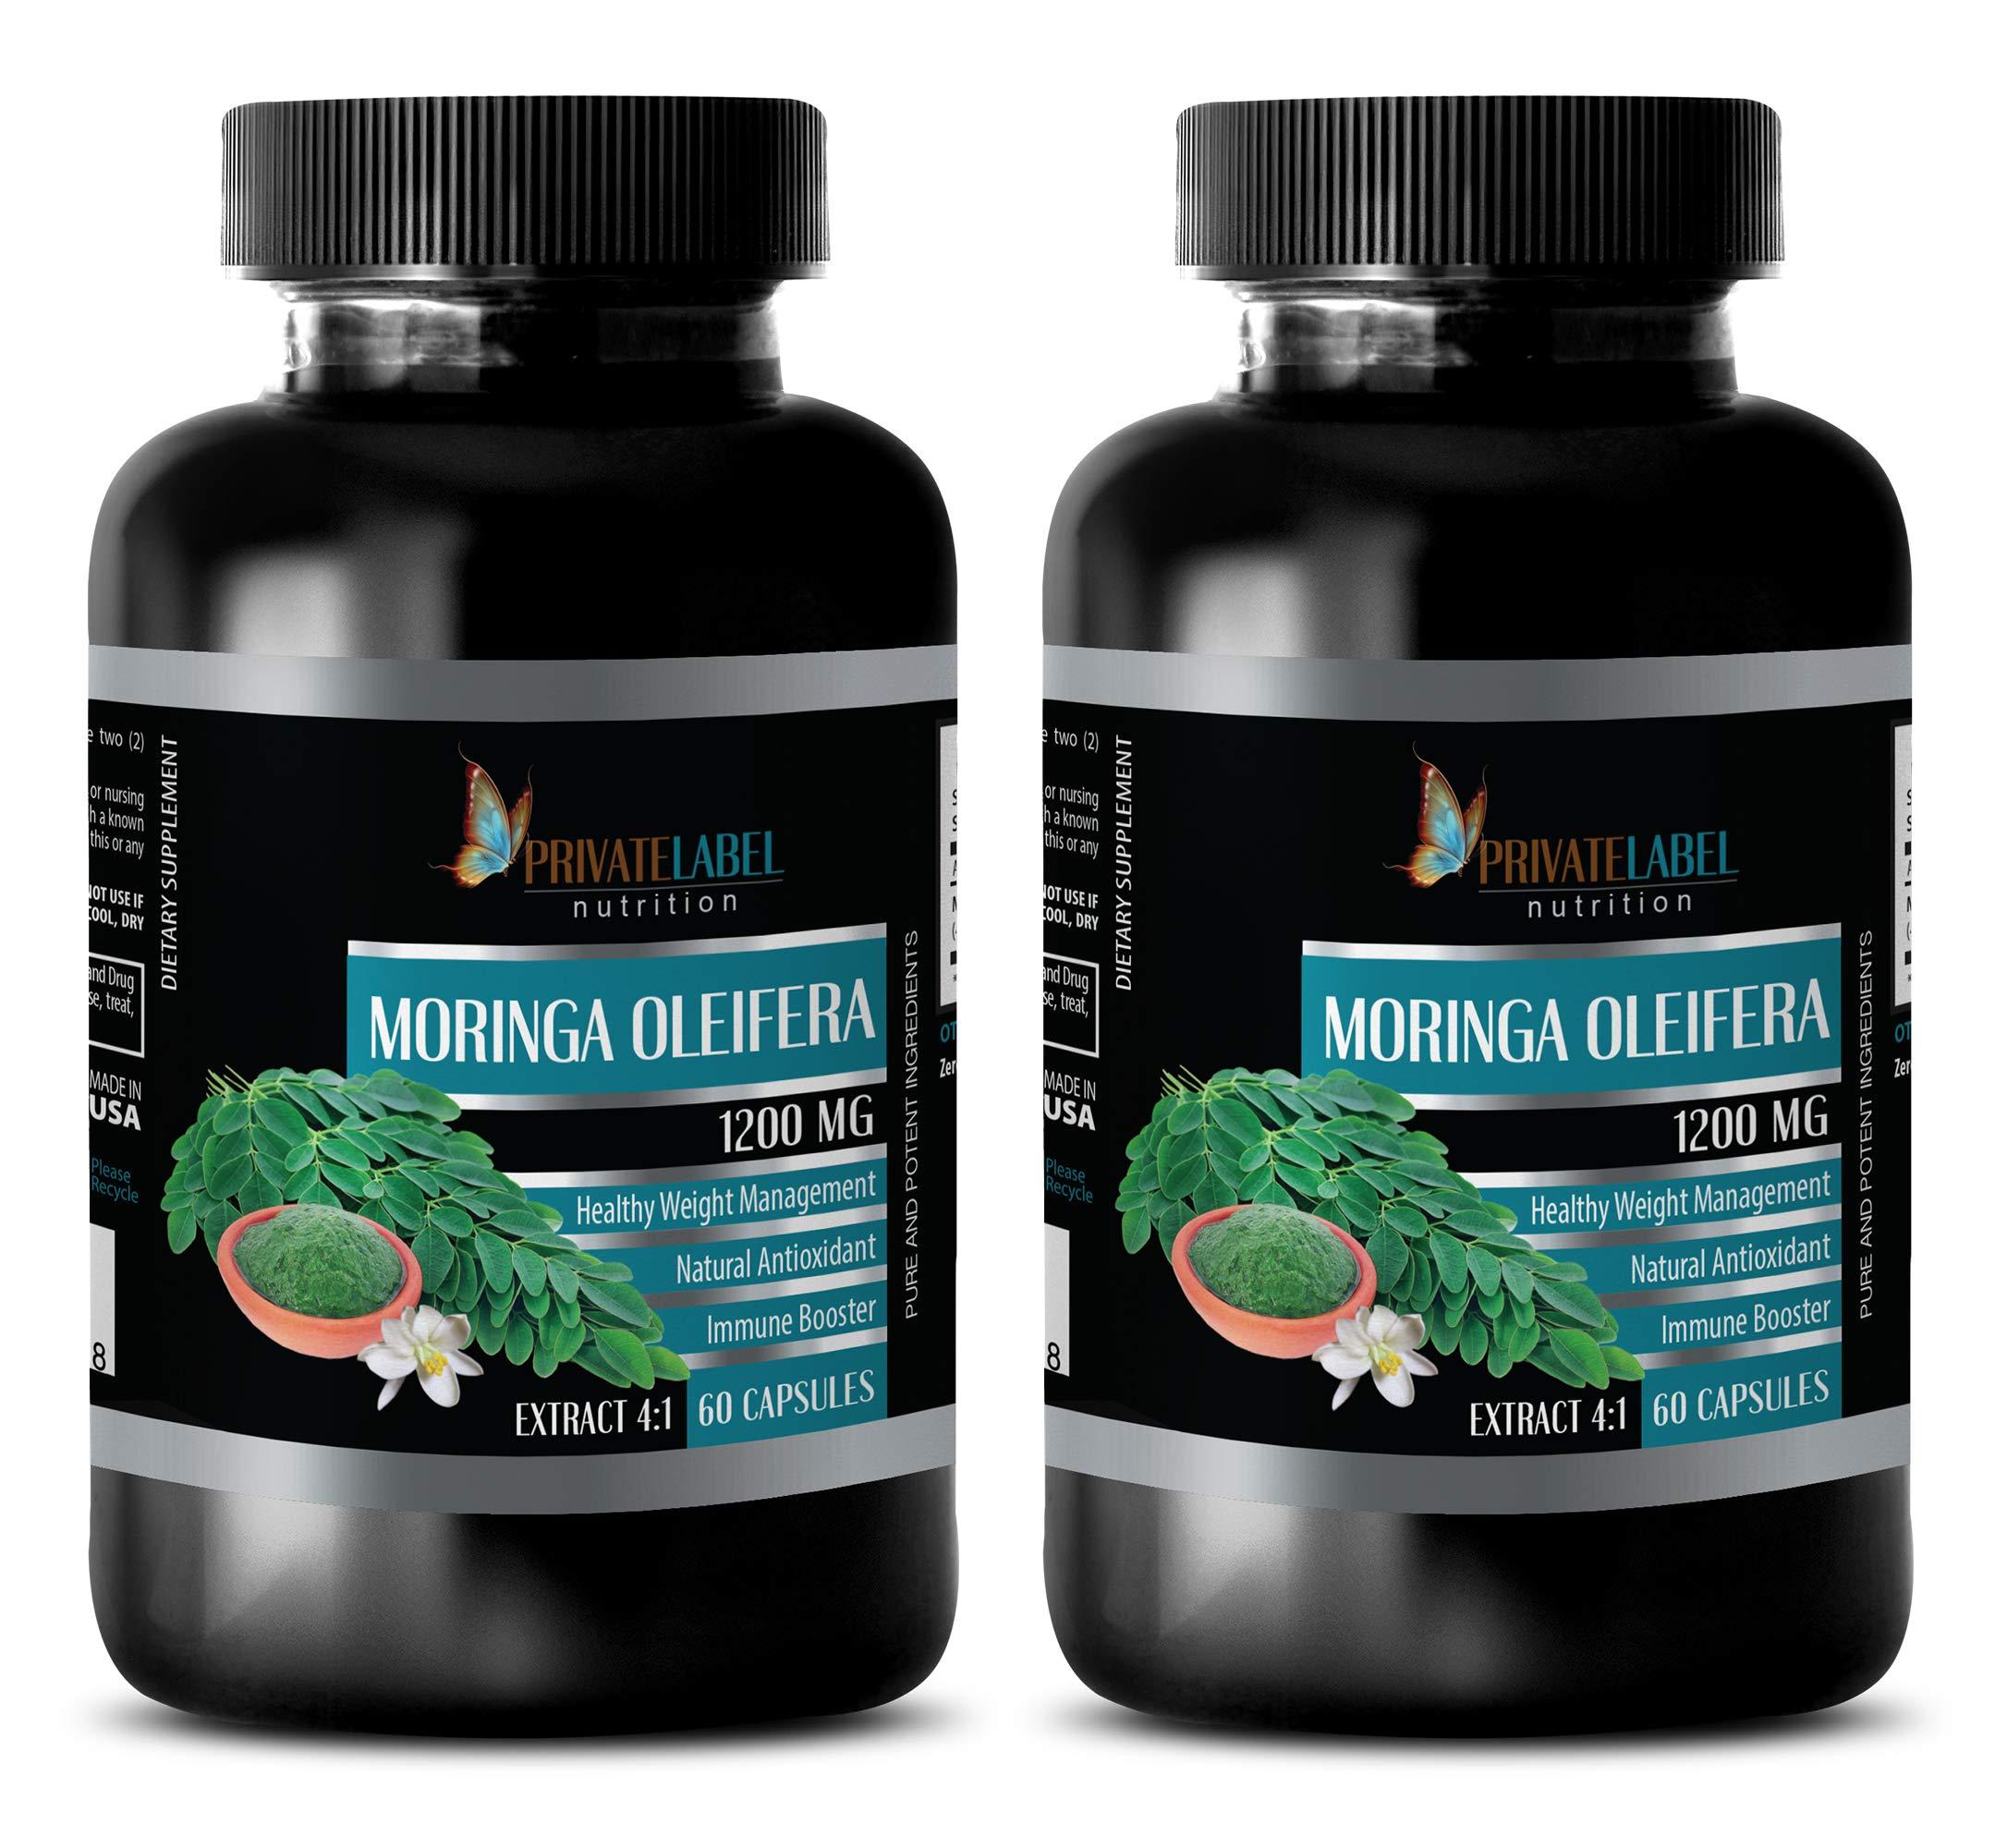 Natural Weight Loss Supplements for Men - Moringa OLEIFERA Extract 4:1 1200MG - Moringa Mood Enhancer - 2 Bottles (120 Capsules)